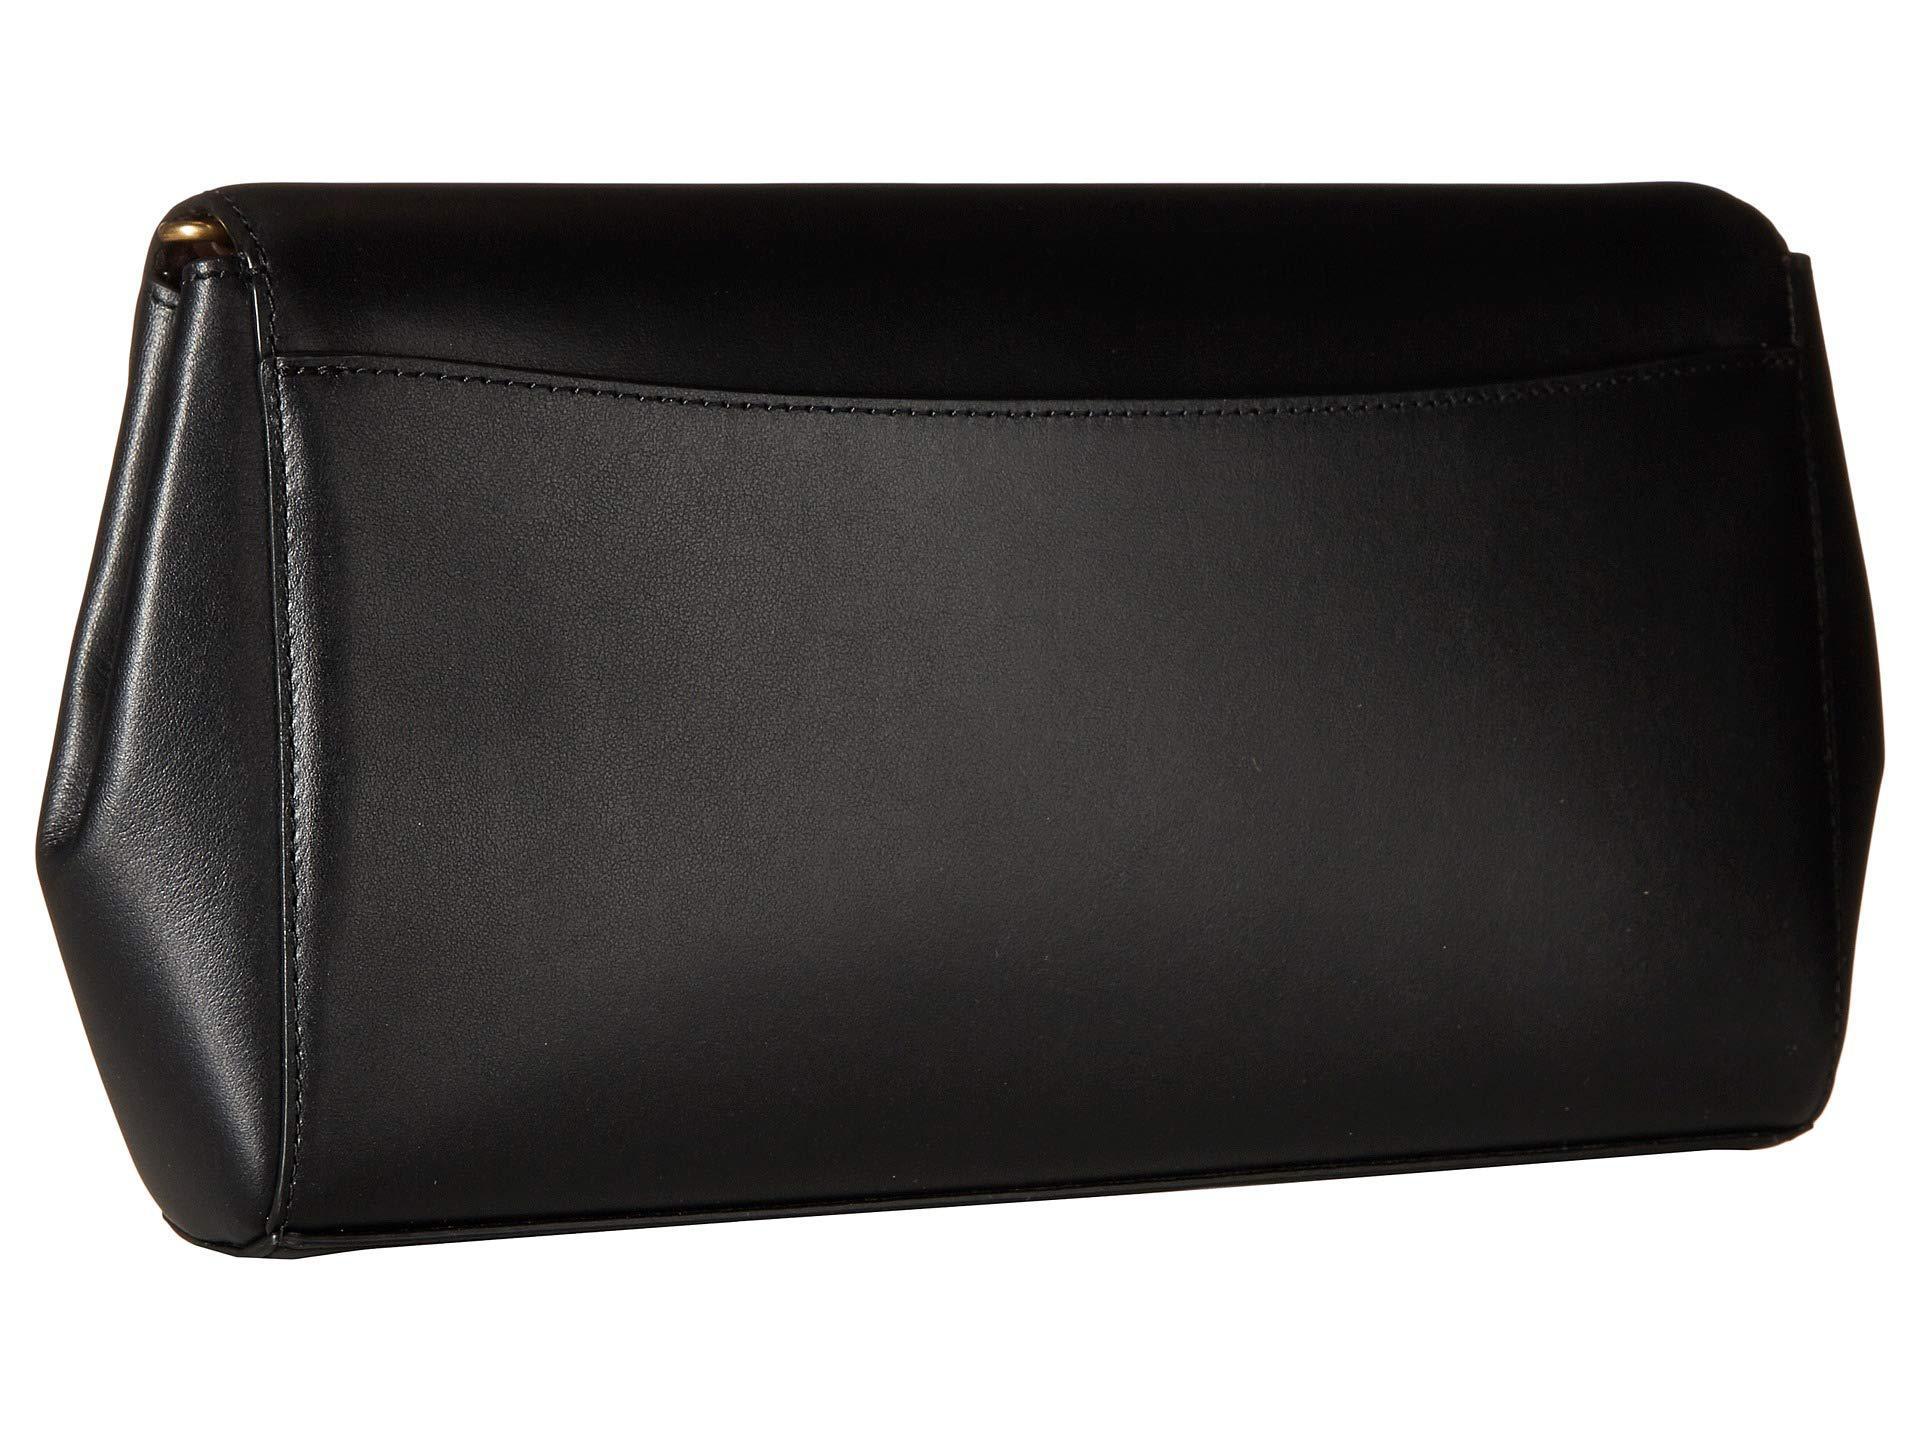 f02079f8bb5f COACH - Smooth Leather Turnlock Clutch With Chain (b4 black) Clutch Handbags  -. View fullscreen